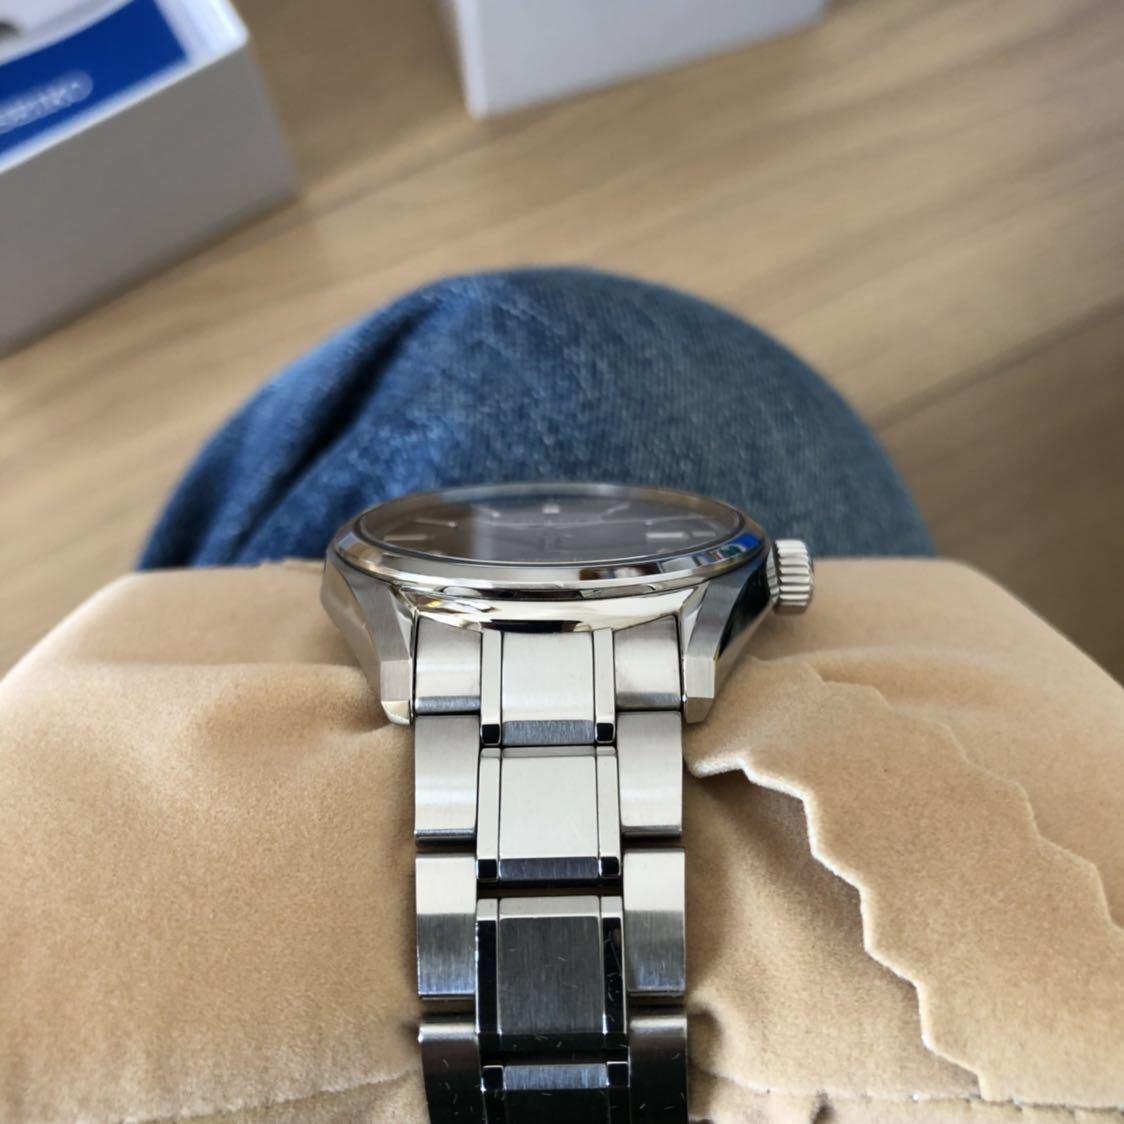 SEIKO PRESAGE SARX035 セイコー プレザージュ 機械式 メカニカル 腕時計 自動巻_画像9